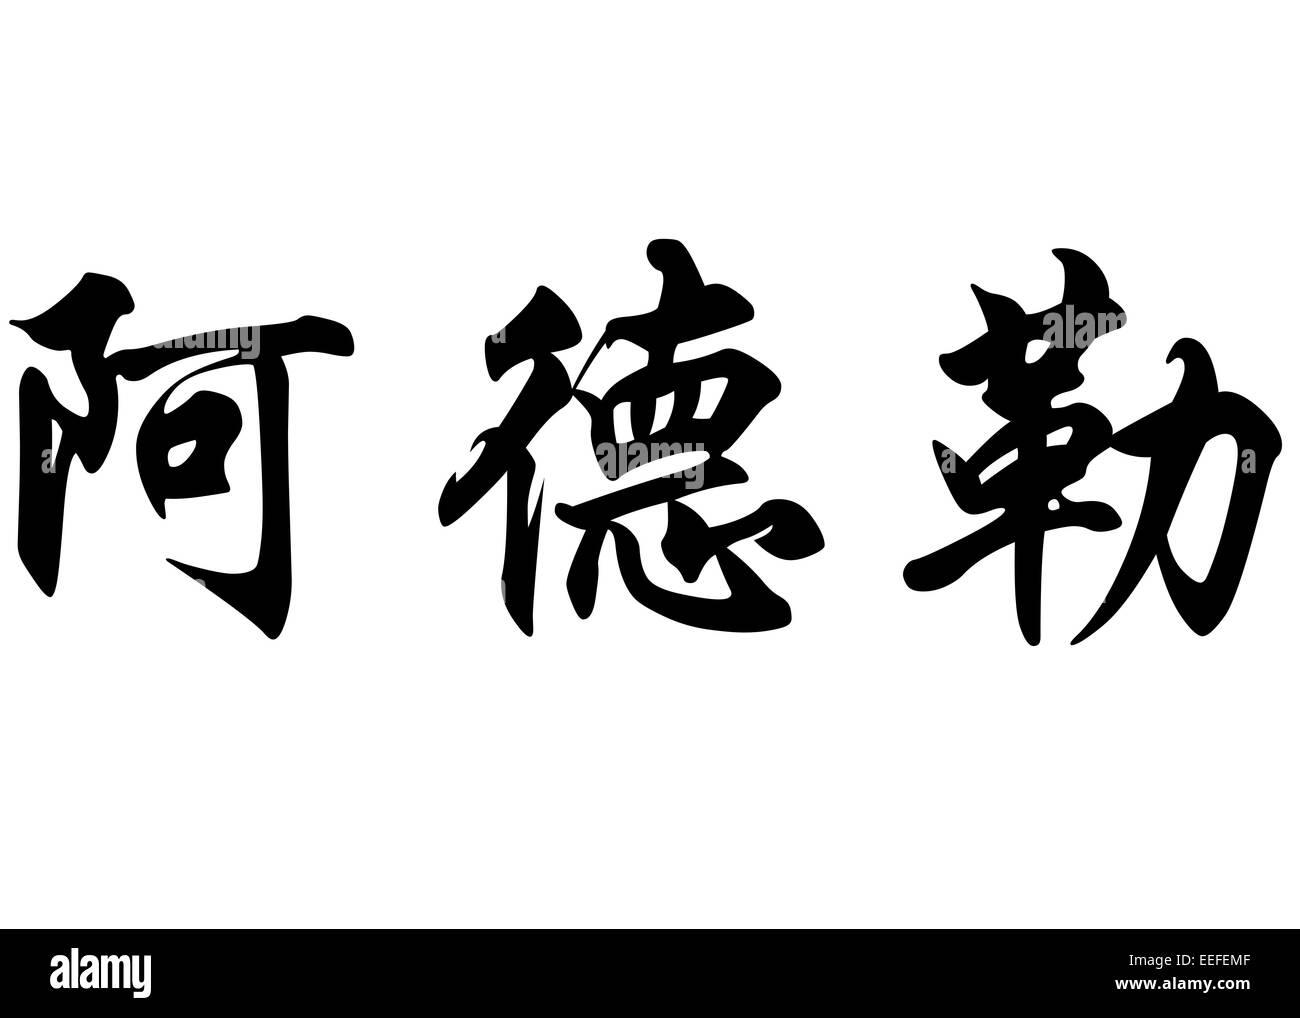 English name adler in chinese kanji calligraphy characters or stock english name adler in chinese kanji calligraphy characters or japanese characters biocorpaavc Choice Image